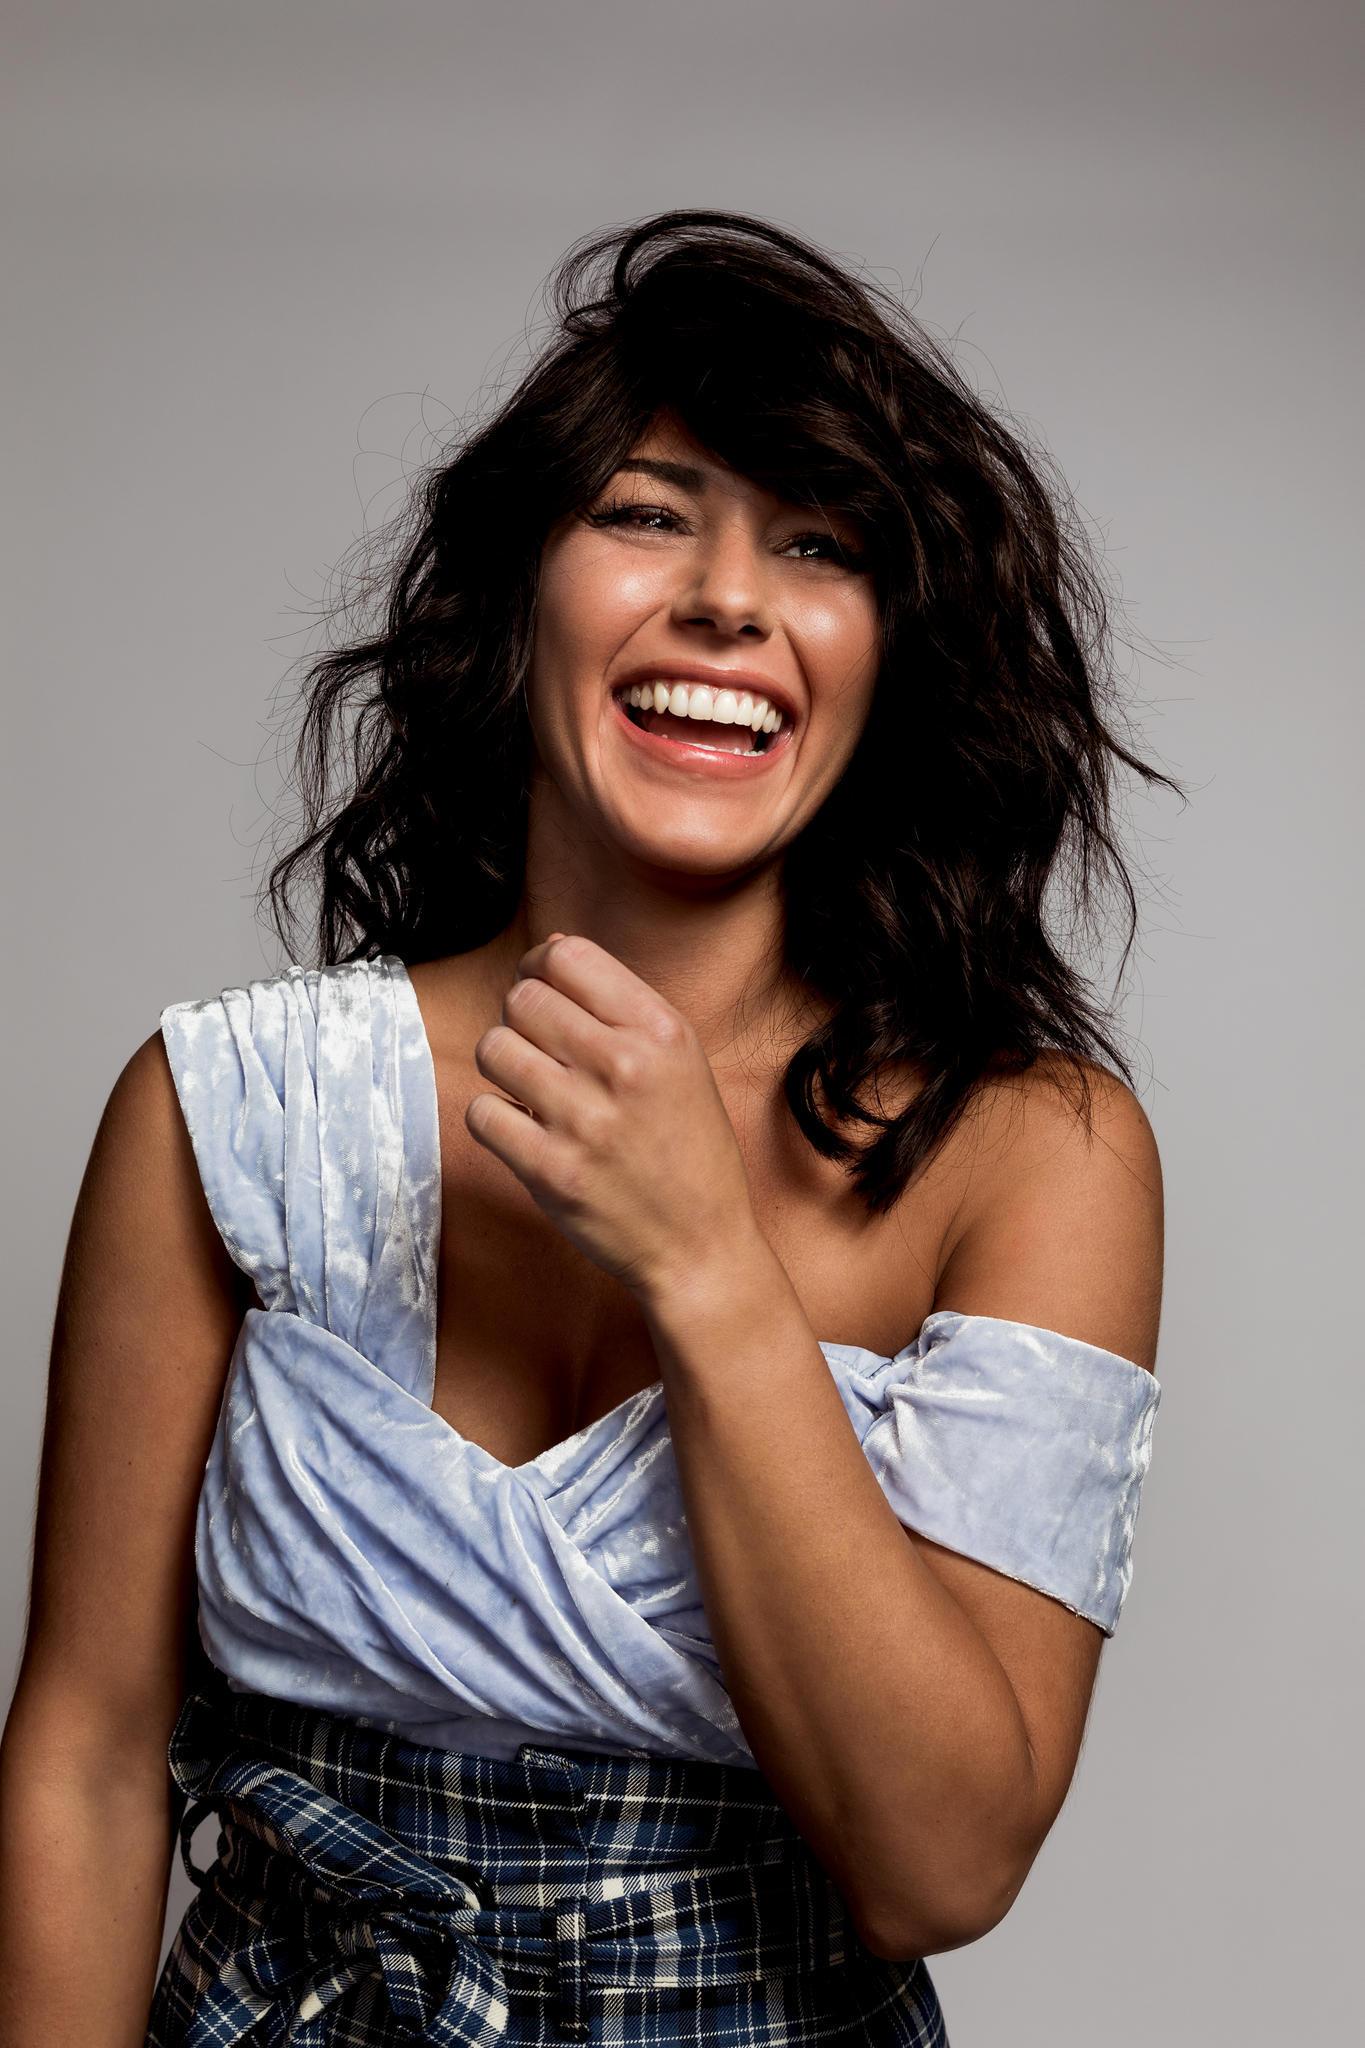 Sarah Lombardi Neue Frisur Neue Single Die Große Veränderung